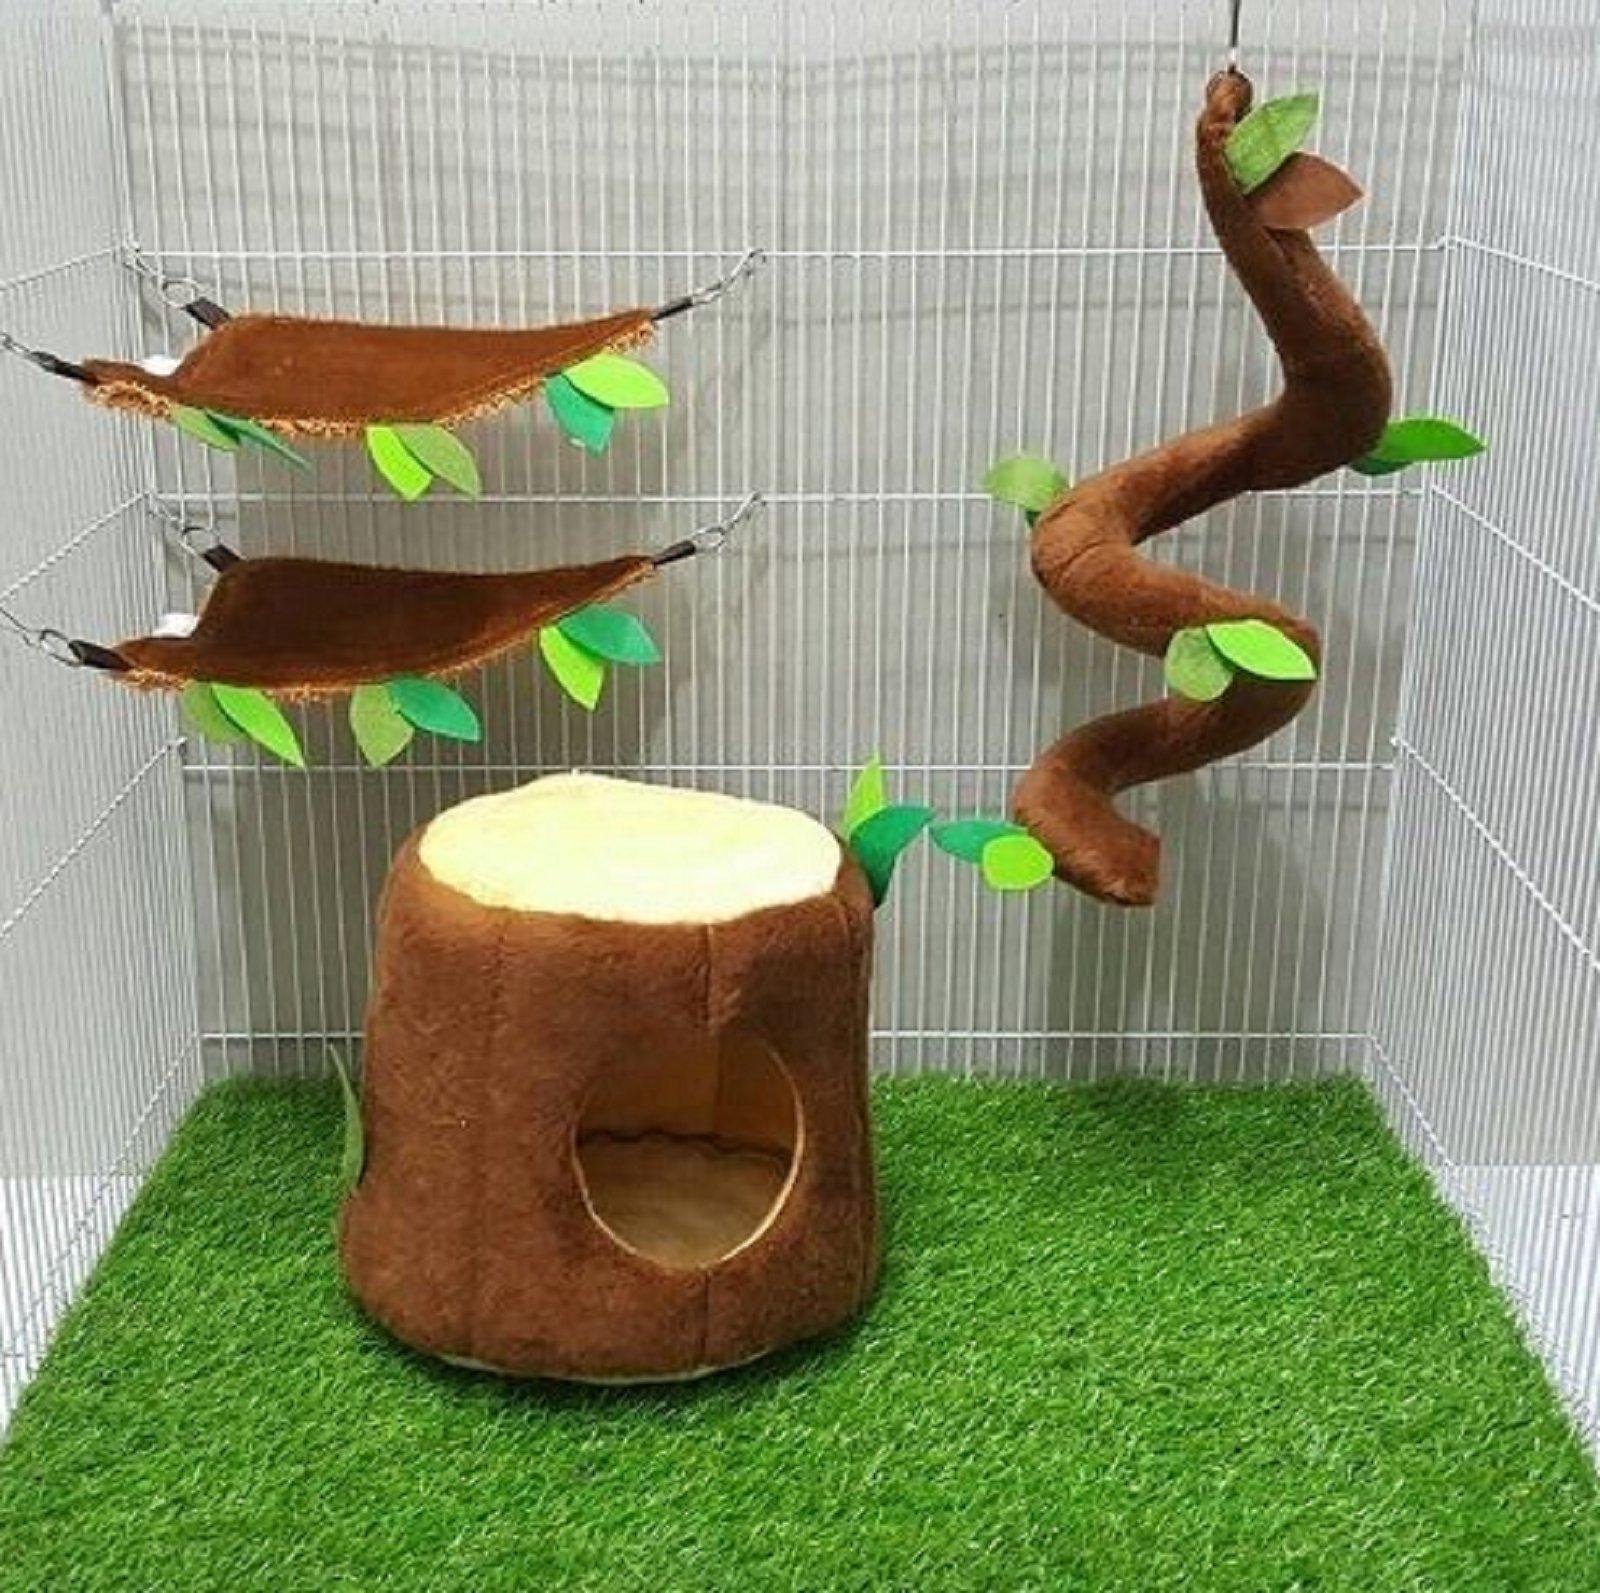 4 Pcs Sugar Glider Hamster Squirrel Chinchillas Small Pet Cage Set Vertical Log Forest Pattern Light Brown Color, Polar Bear's Republic by Polar Bear's Pet Shop